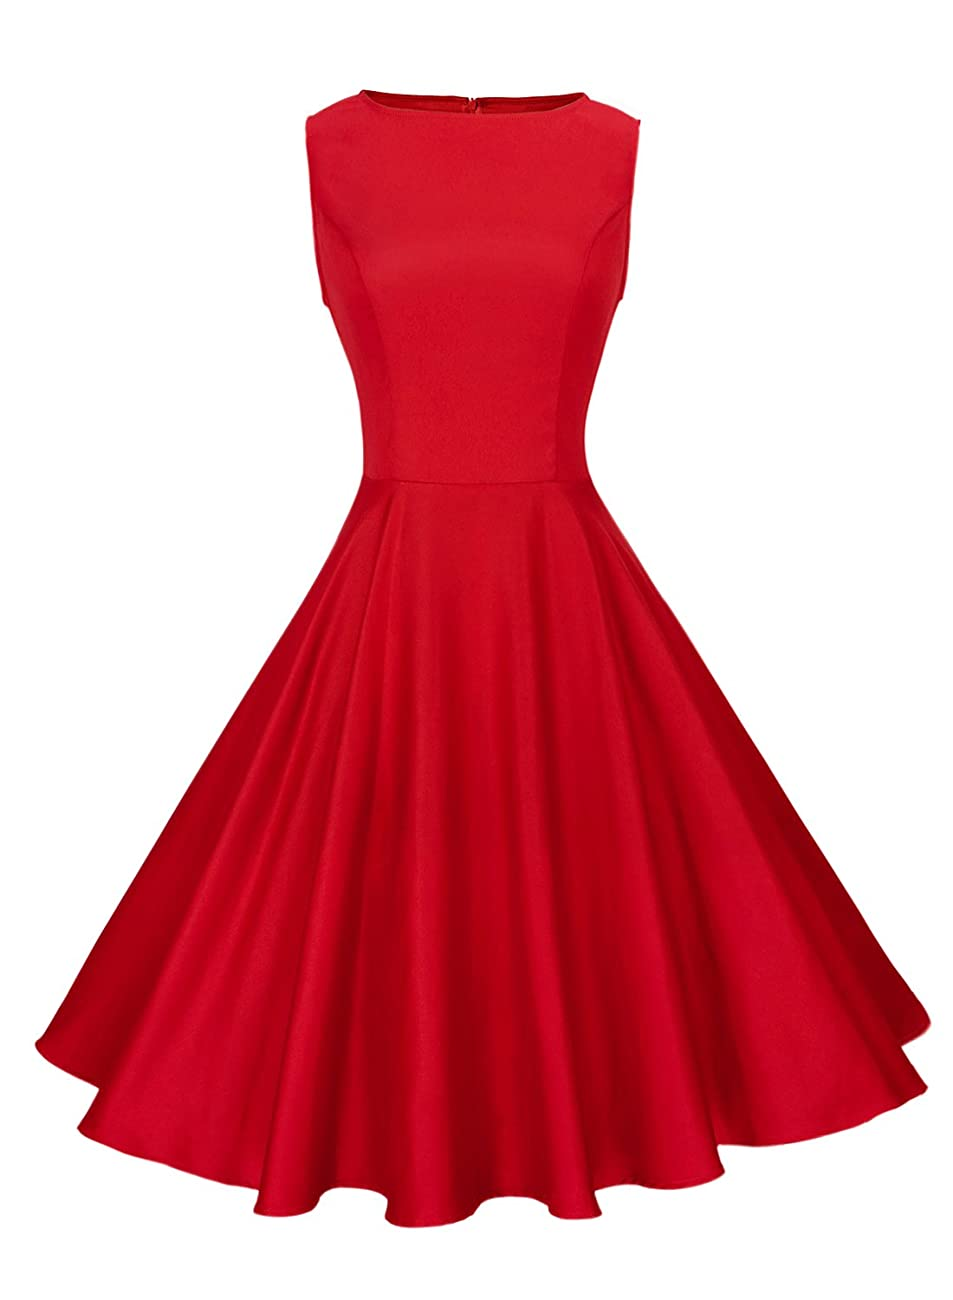 Anni Coco Women's Classy Audrey Hepburn 1950s Vintage Rockabilly Swing Dress 0